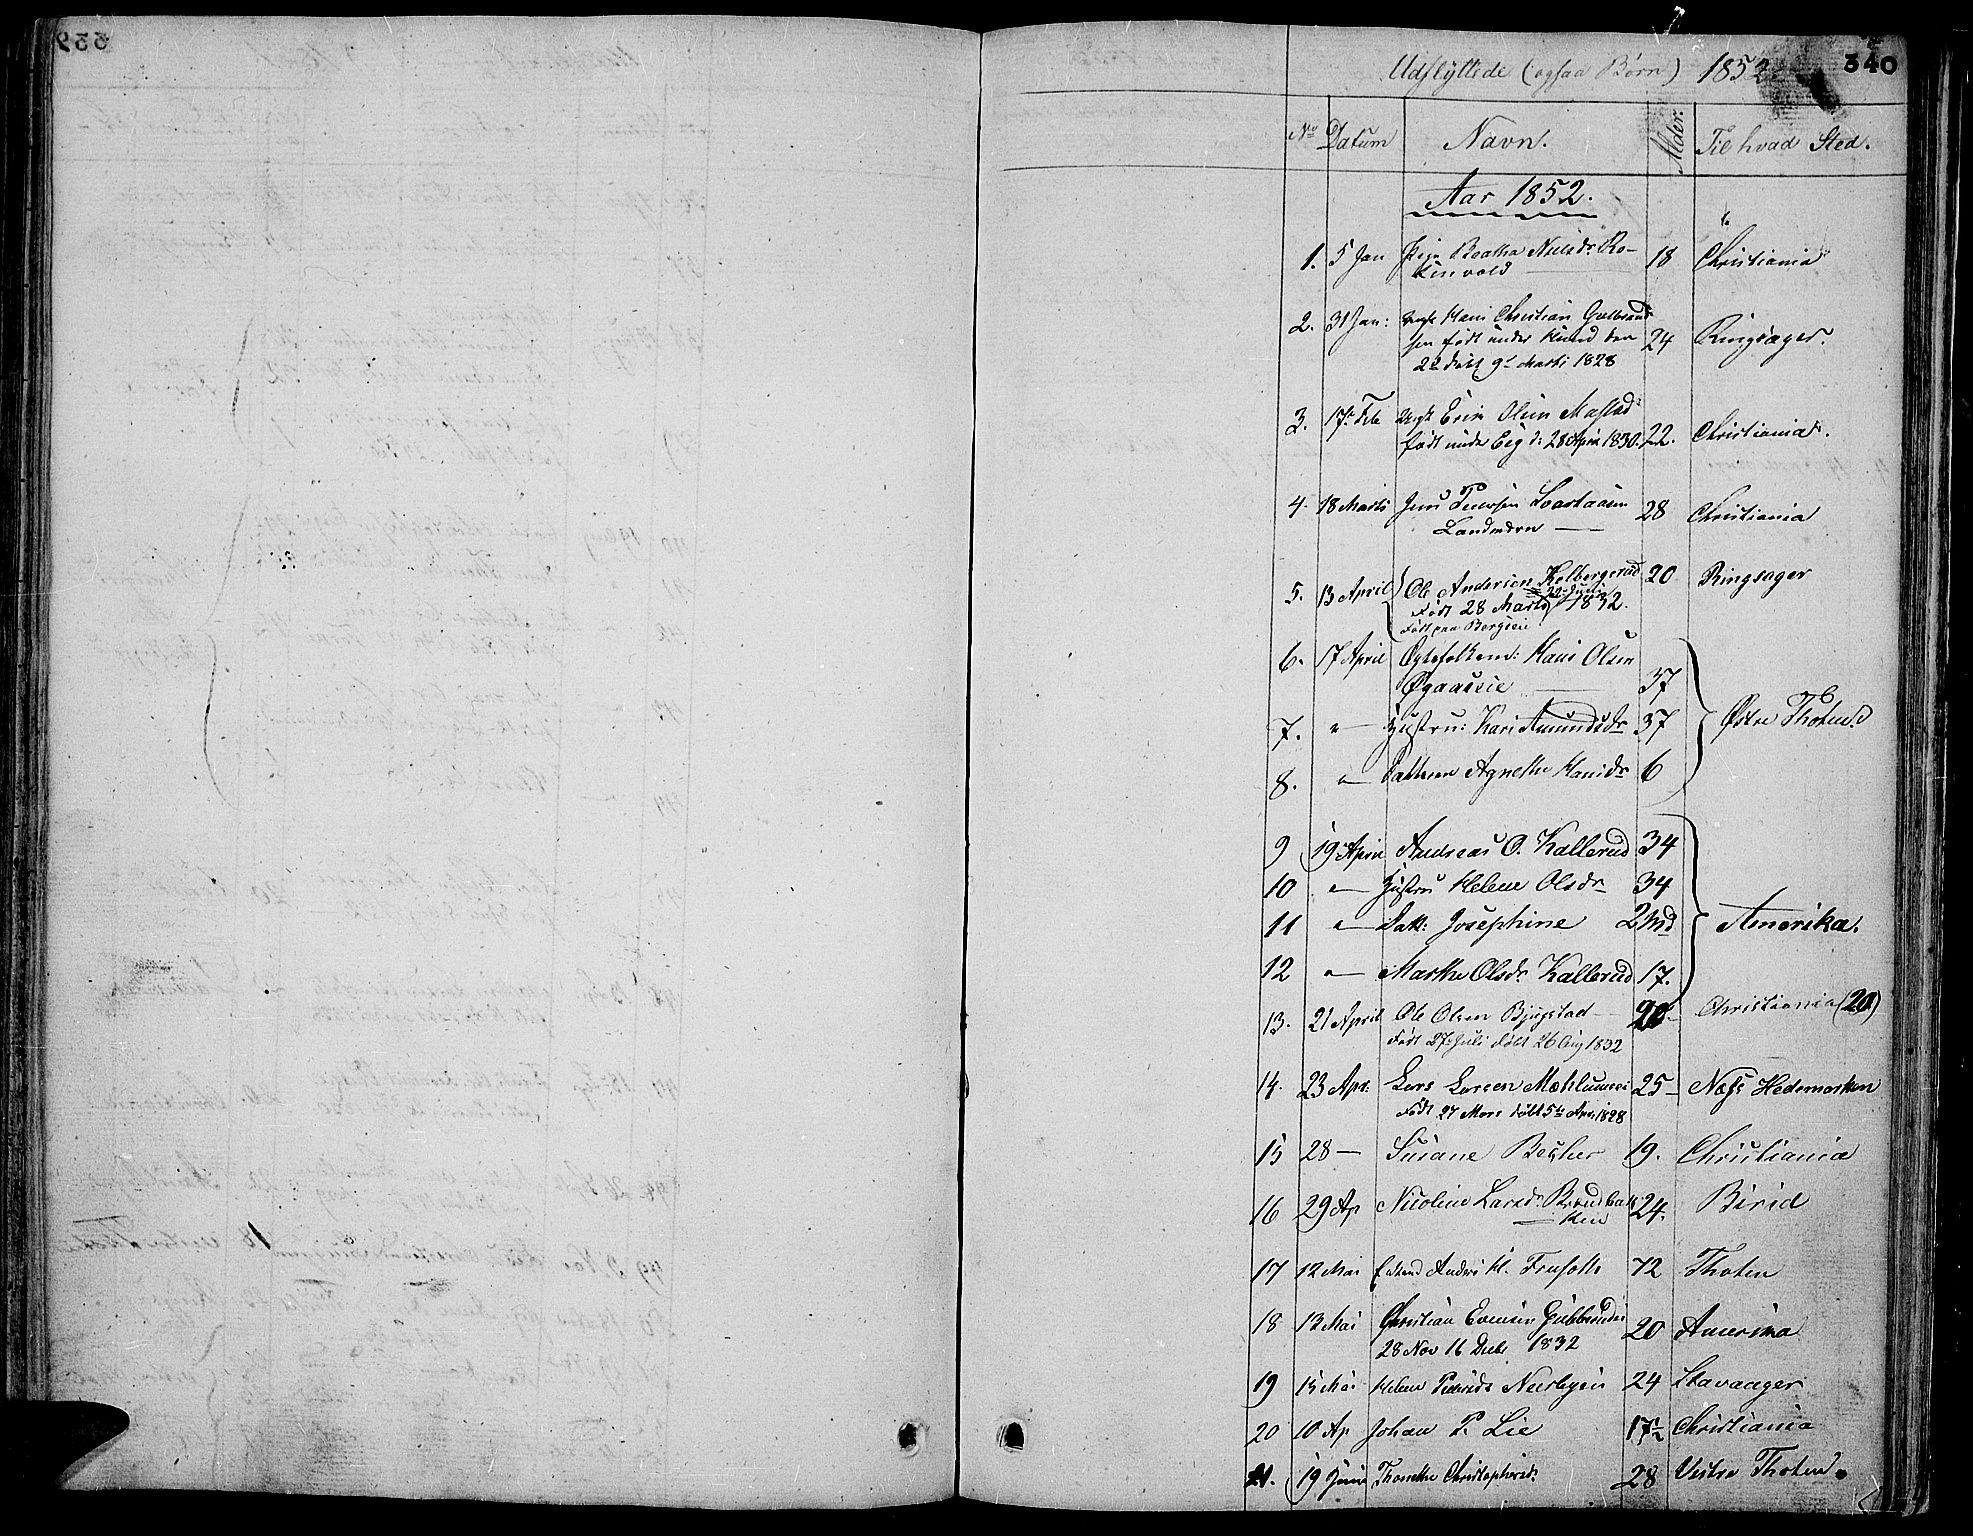 SAH, Vardal prestekontor, H/Ha/Hab/L0004: Klokkerbok nr. 4, 1831-1853, s. 340